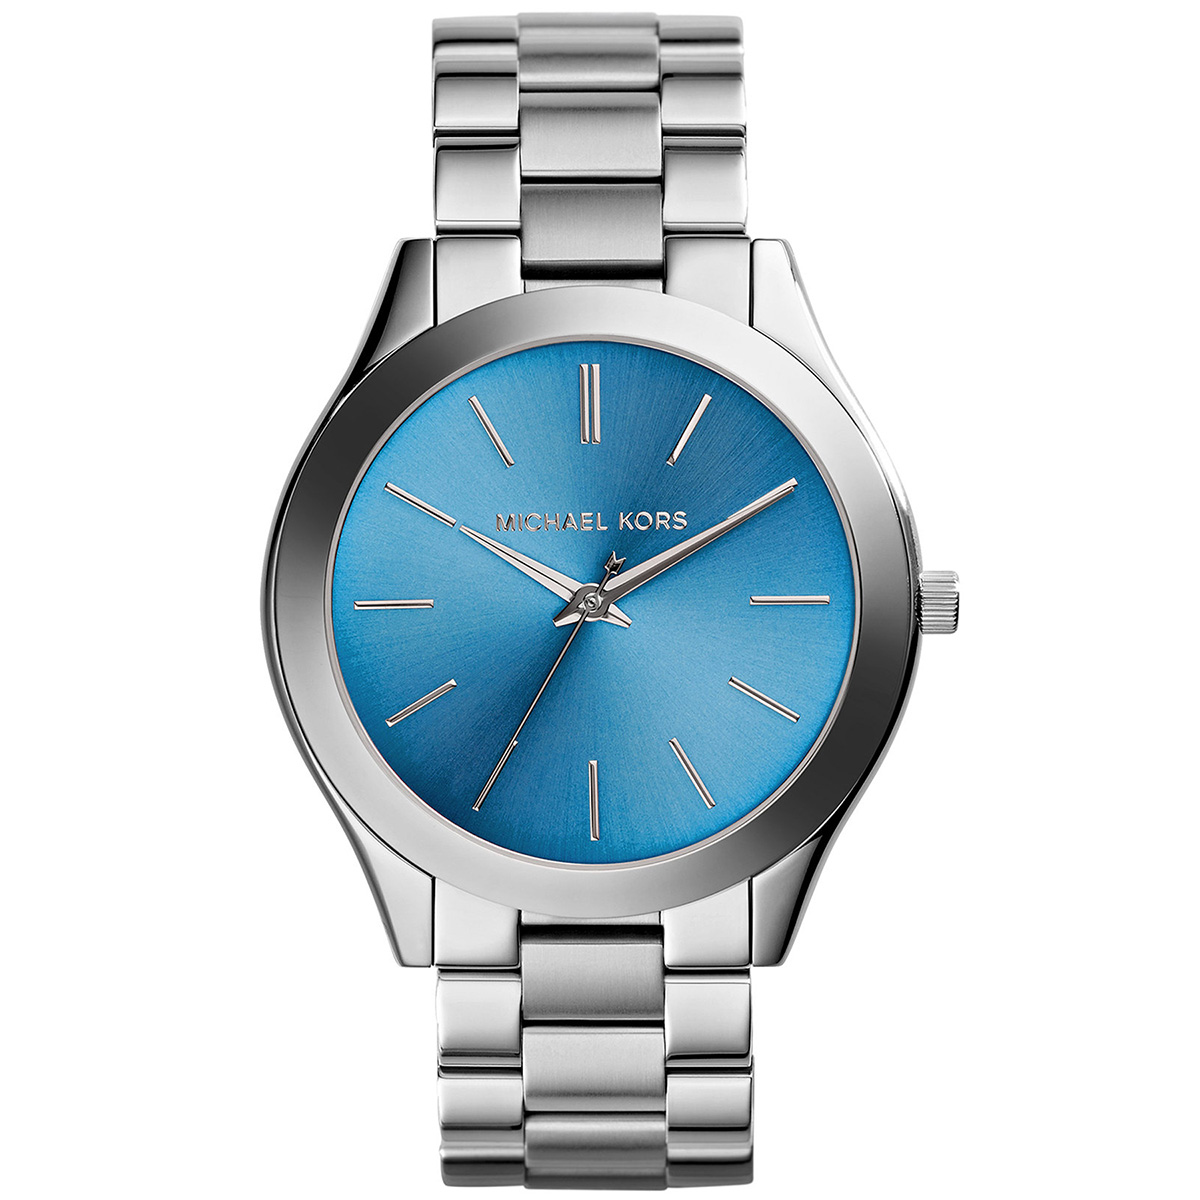 Damenuhren michael kors blau  Michael Kors Uhr MK3292 Runway Damenuhr Silber Blau Edelstahl Slim ...